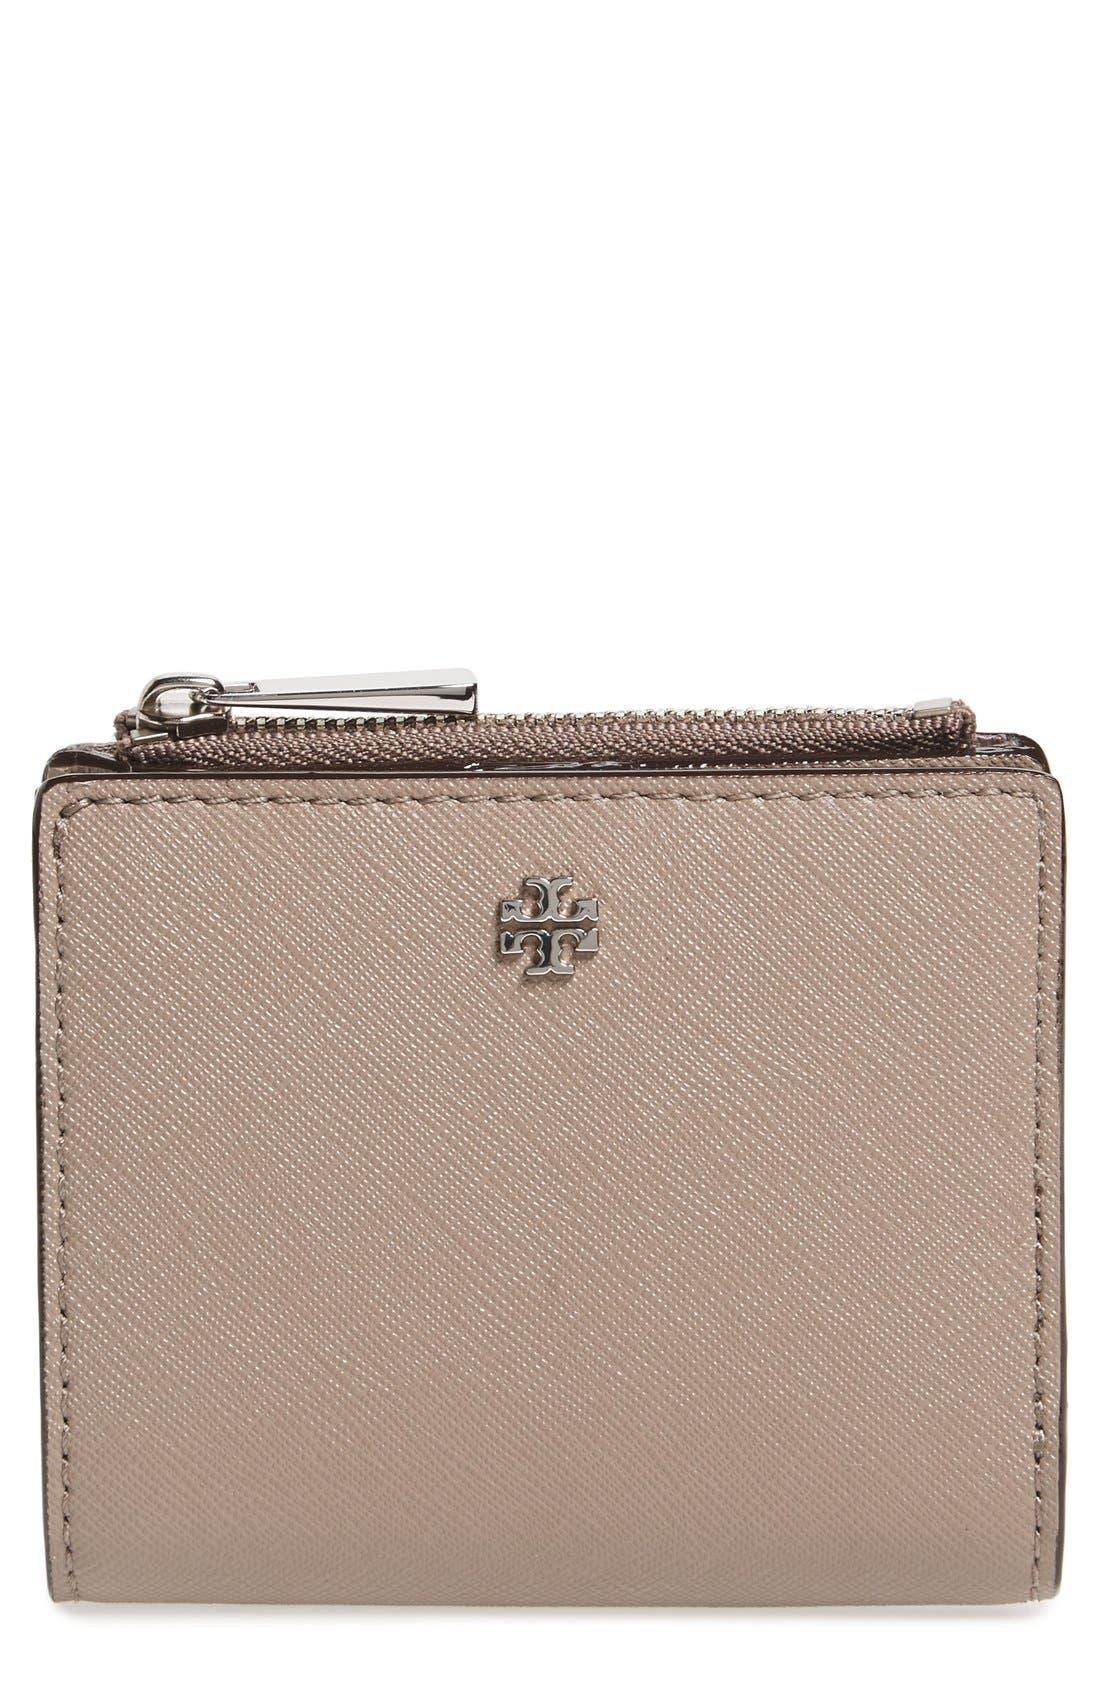 Tory Burch 'Mini Robinson' Leather Wallet